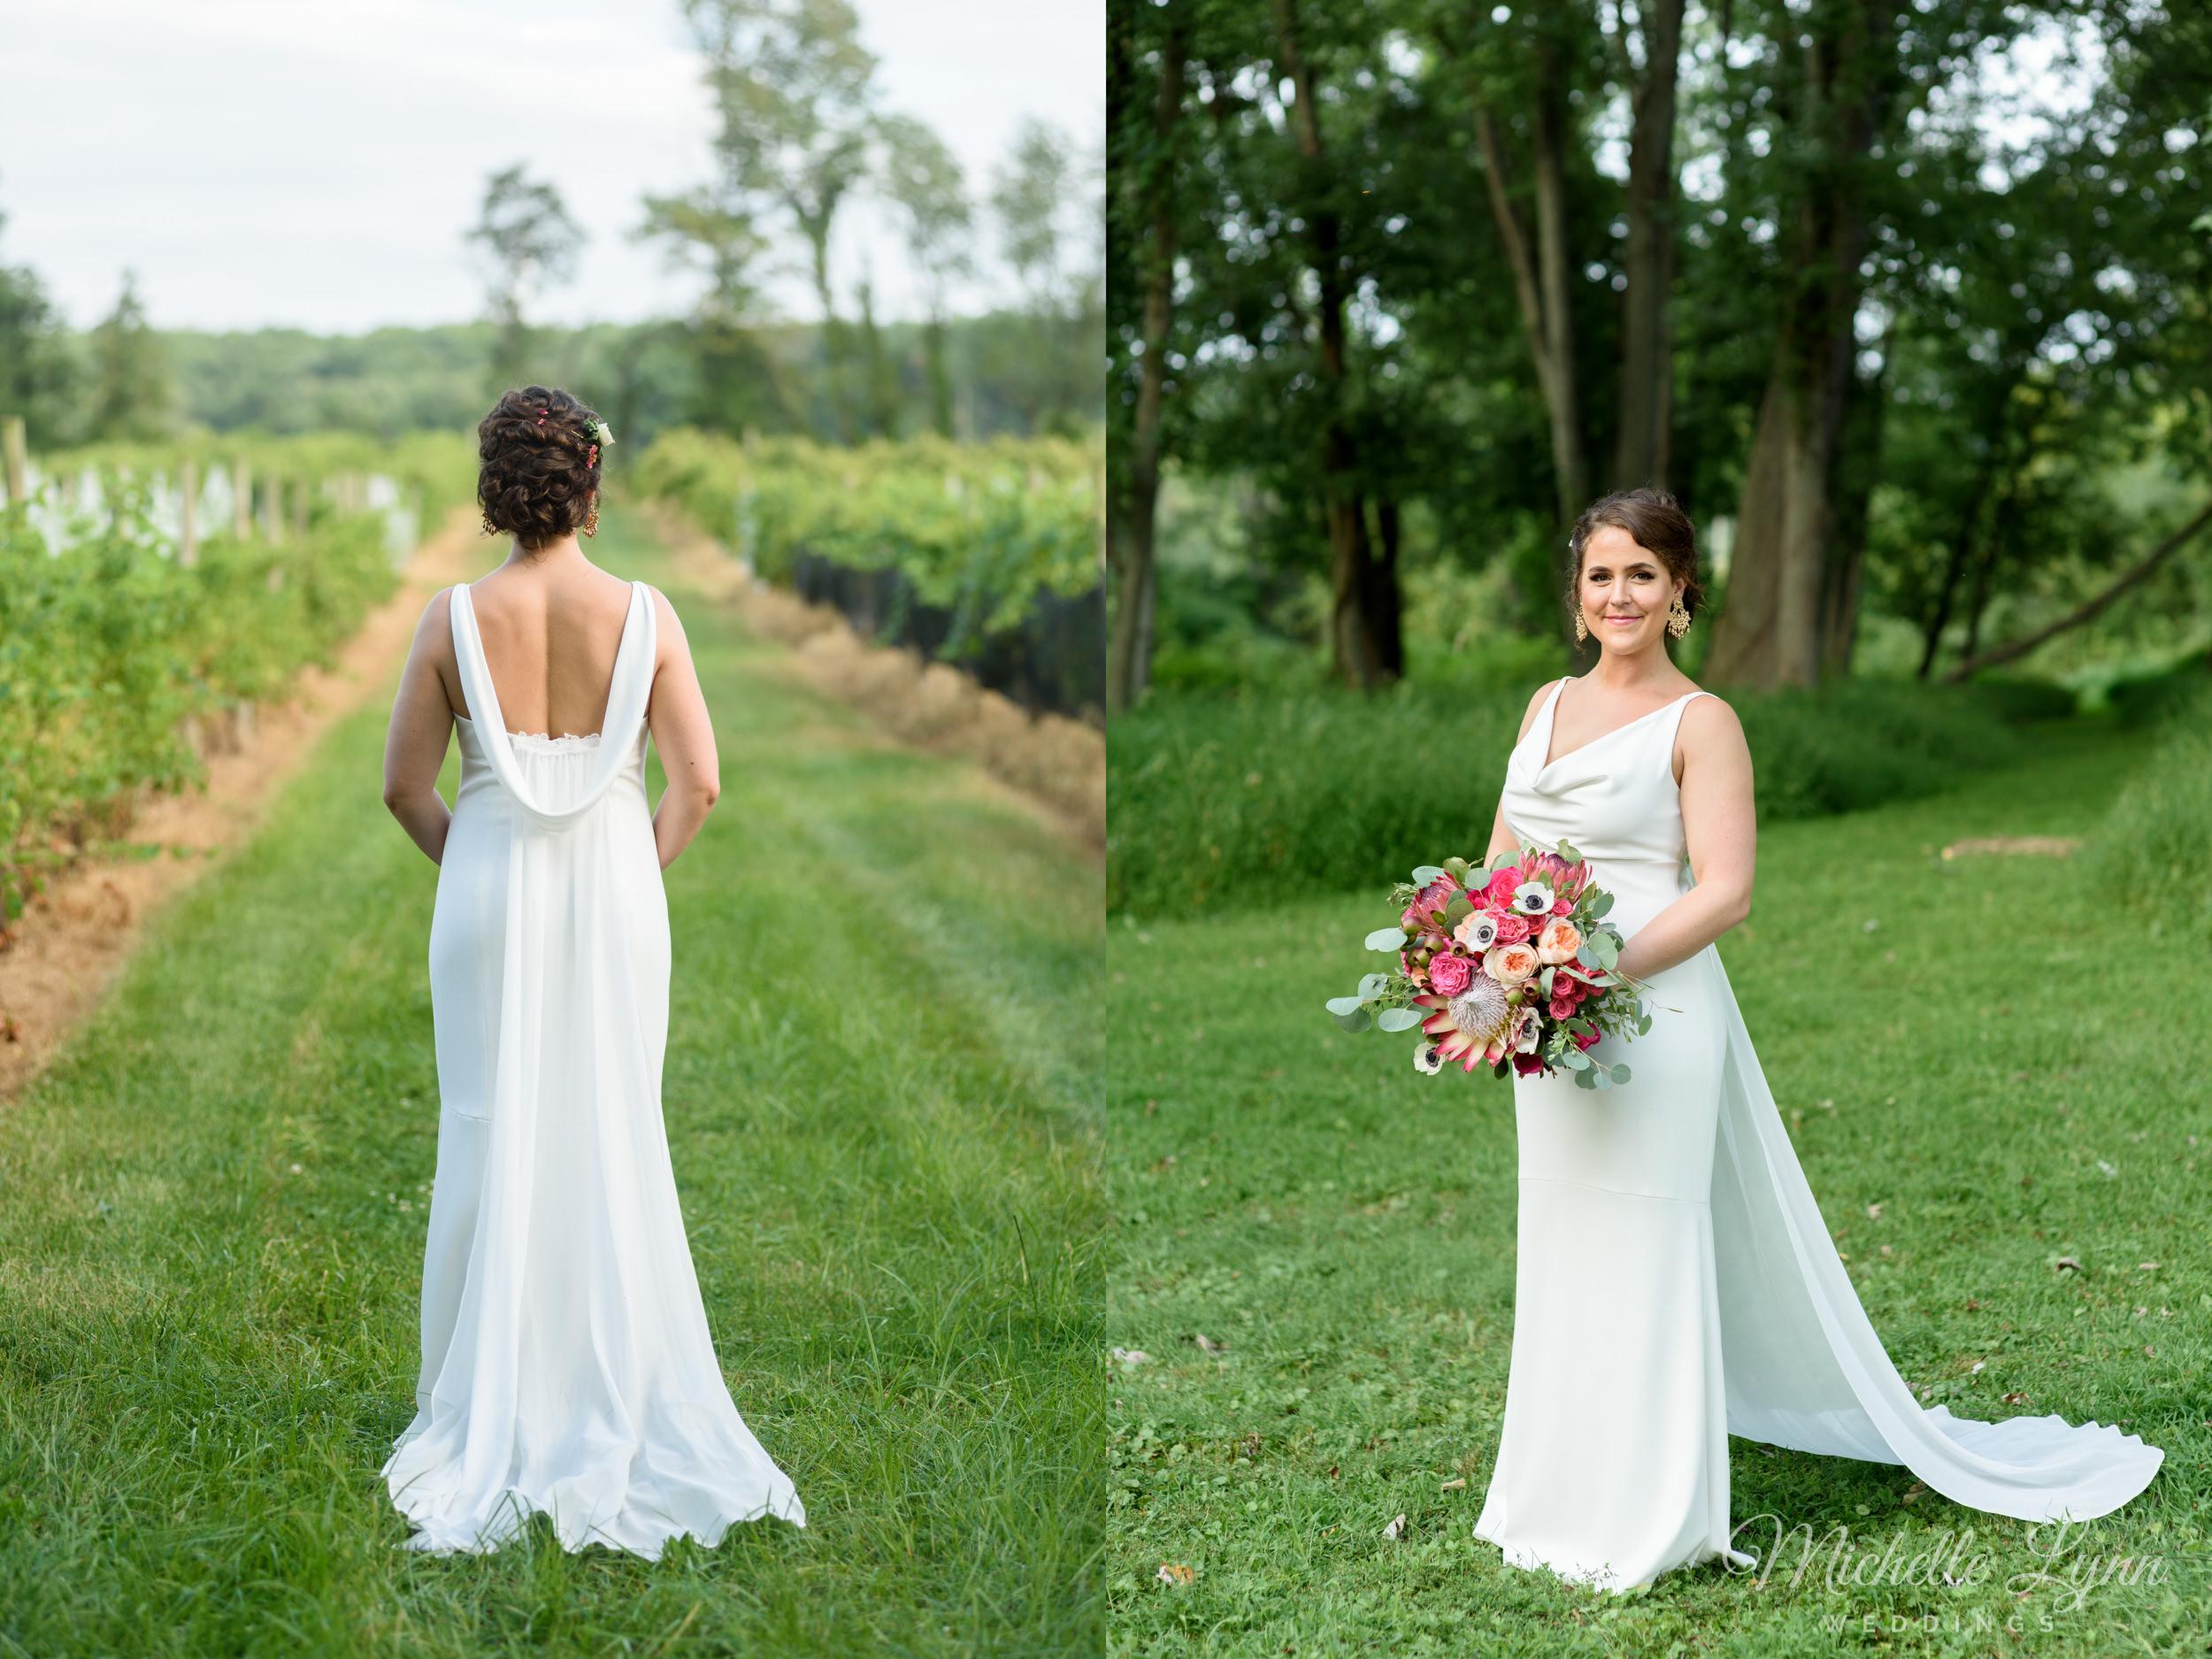 mlw-unionville-vineyards-nj-wedding-photography-56.jpg